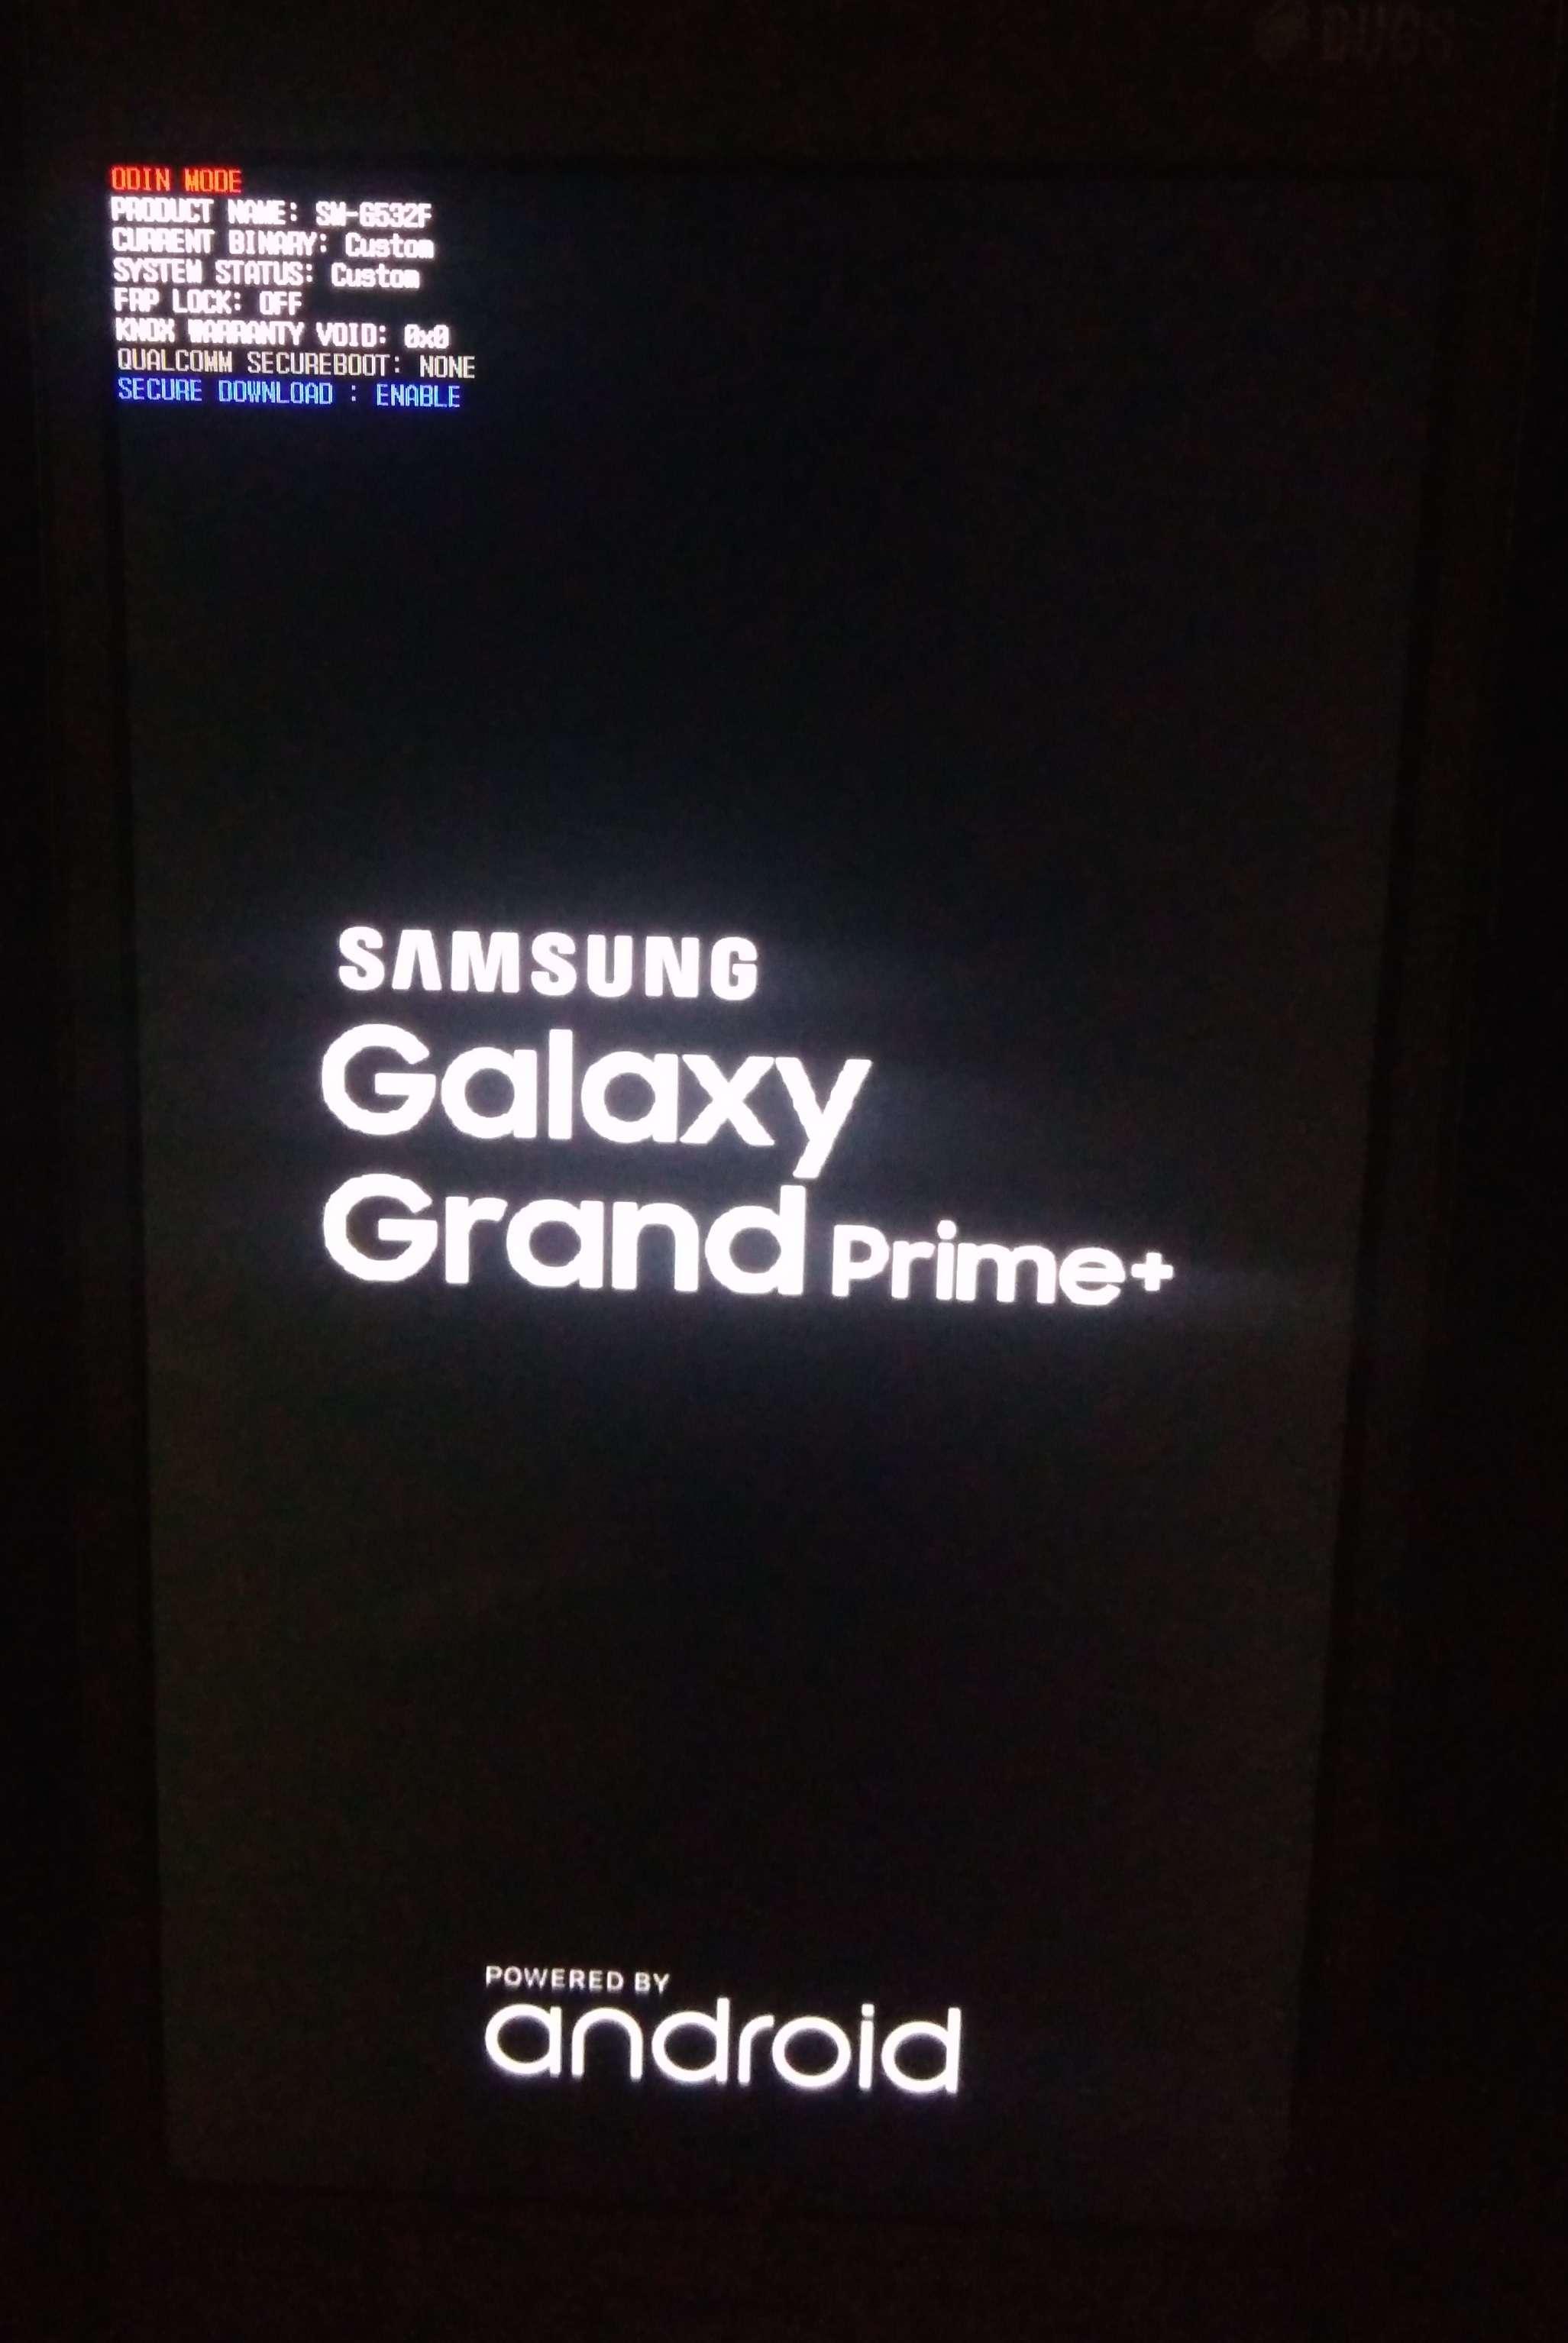 SM-G532f Stuck on Galaxy GRAND PRIME+ Logo[Solved] - GSM-Forum